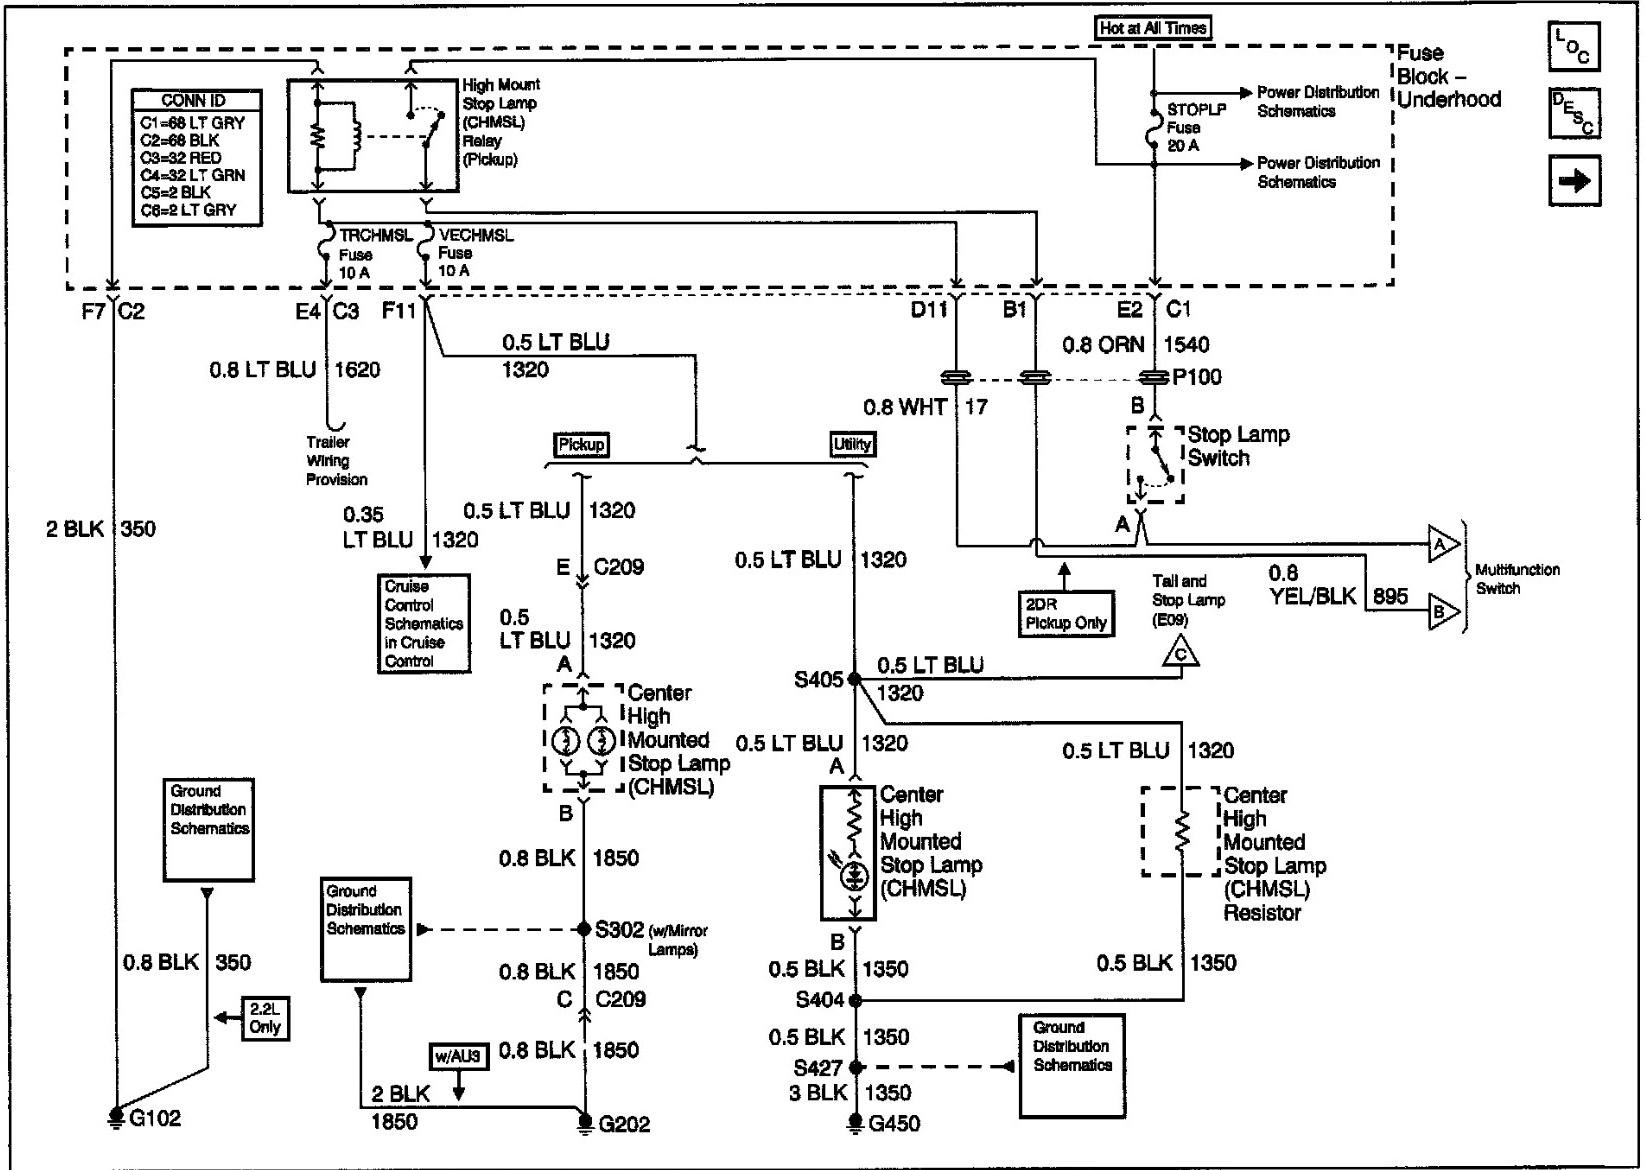 2002 gmc sonoma wiring diagram lights nezZZma?resize=665%2C473&ssl=1 mitsubishi triton trailer wiring diagram wiring diagram mitsubishi triton trailer wiring diagram at reclaimingppi.co